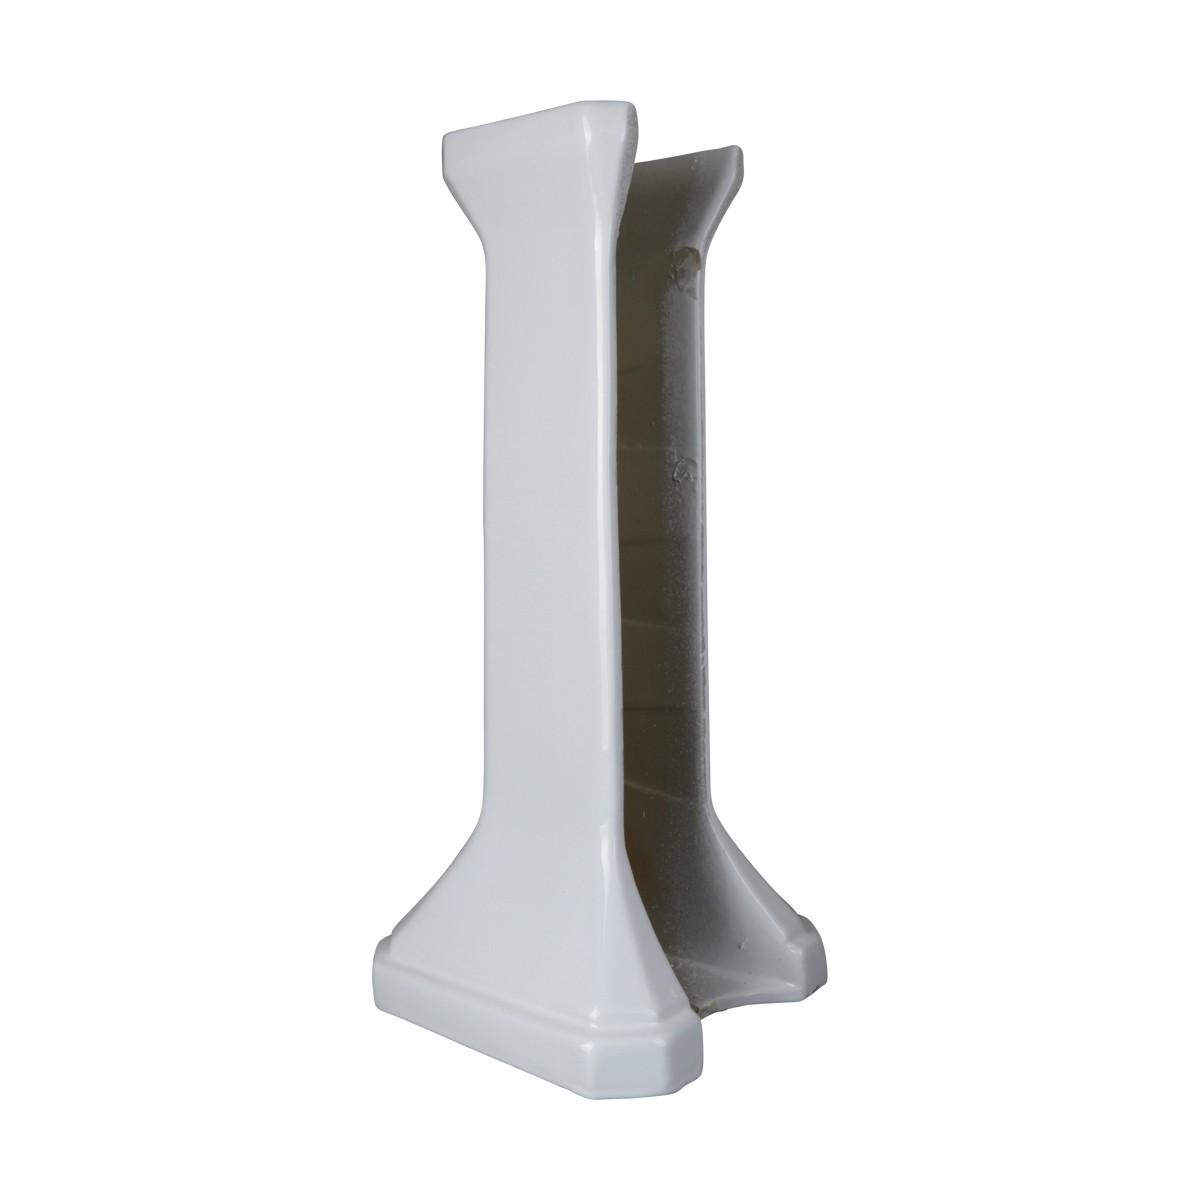 Bathroom Sink Part White Porcelain Ashley Pedestal Only White Pedestal Only Glossy Pedestal Only Bathroom China Pedestal Only